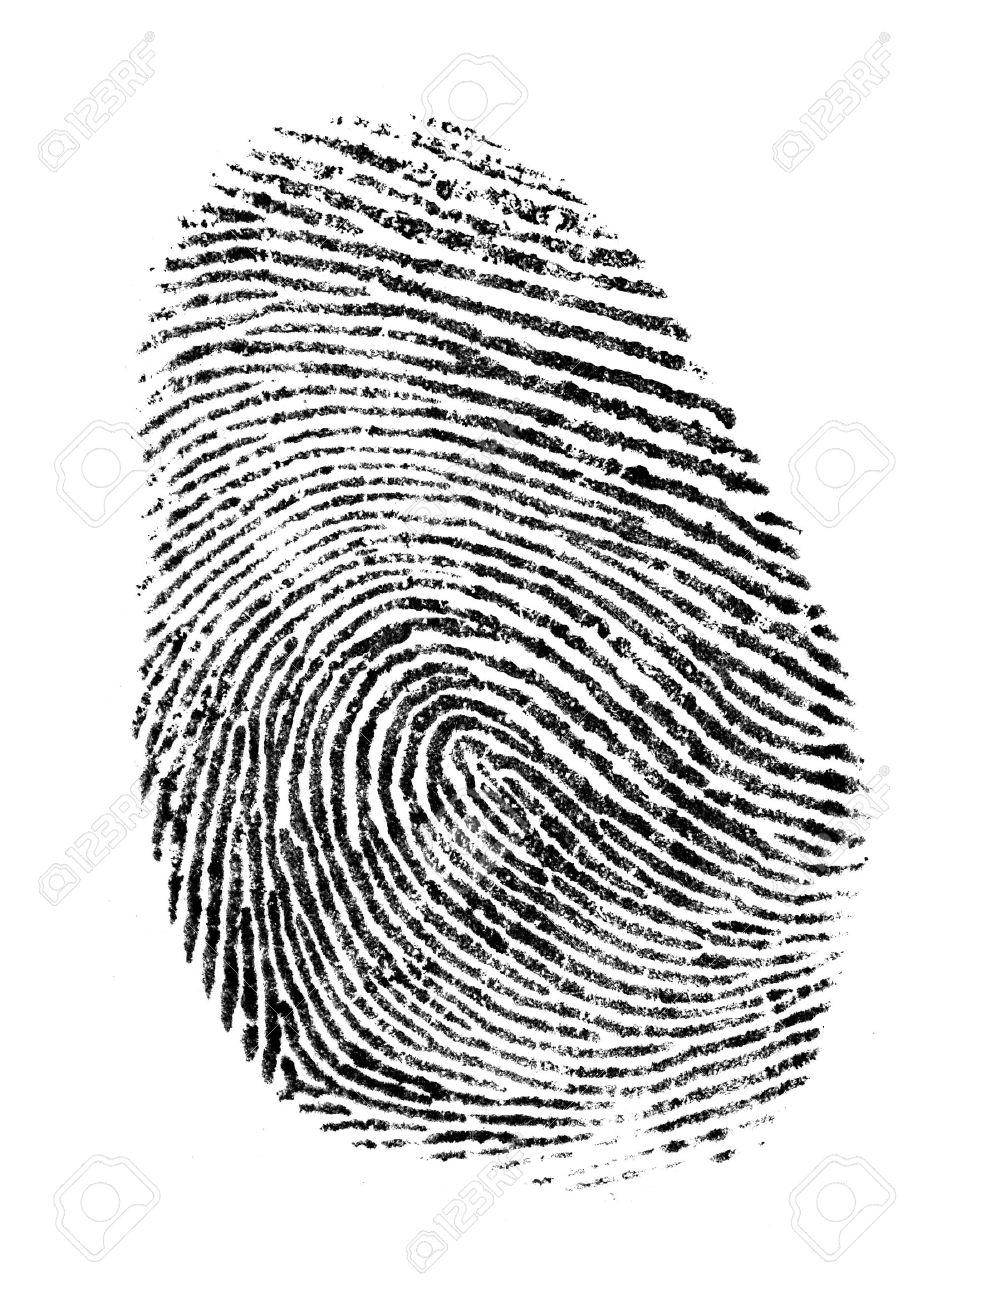 Black Ink Fingerprint Isolated on a White Background. - 51202600